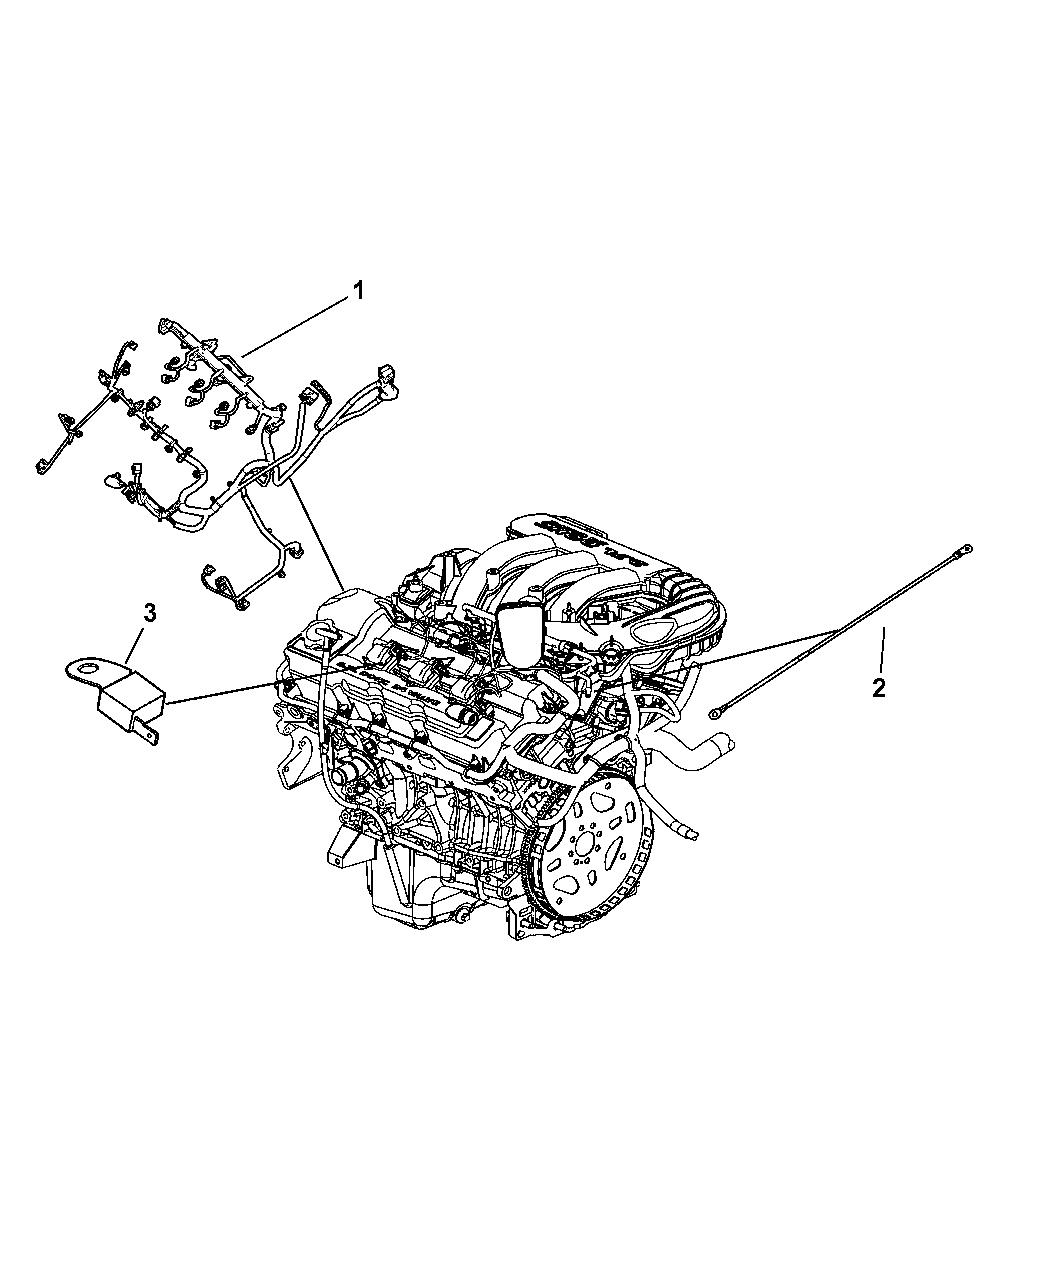 2008 Dodge Charger Wiring - Engine - Mopar Parts Giant